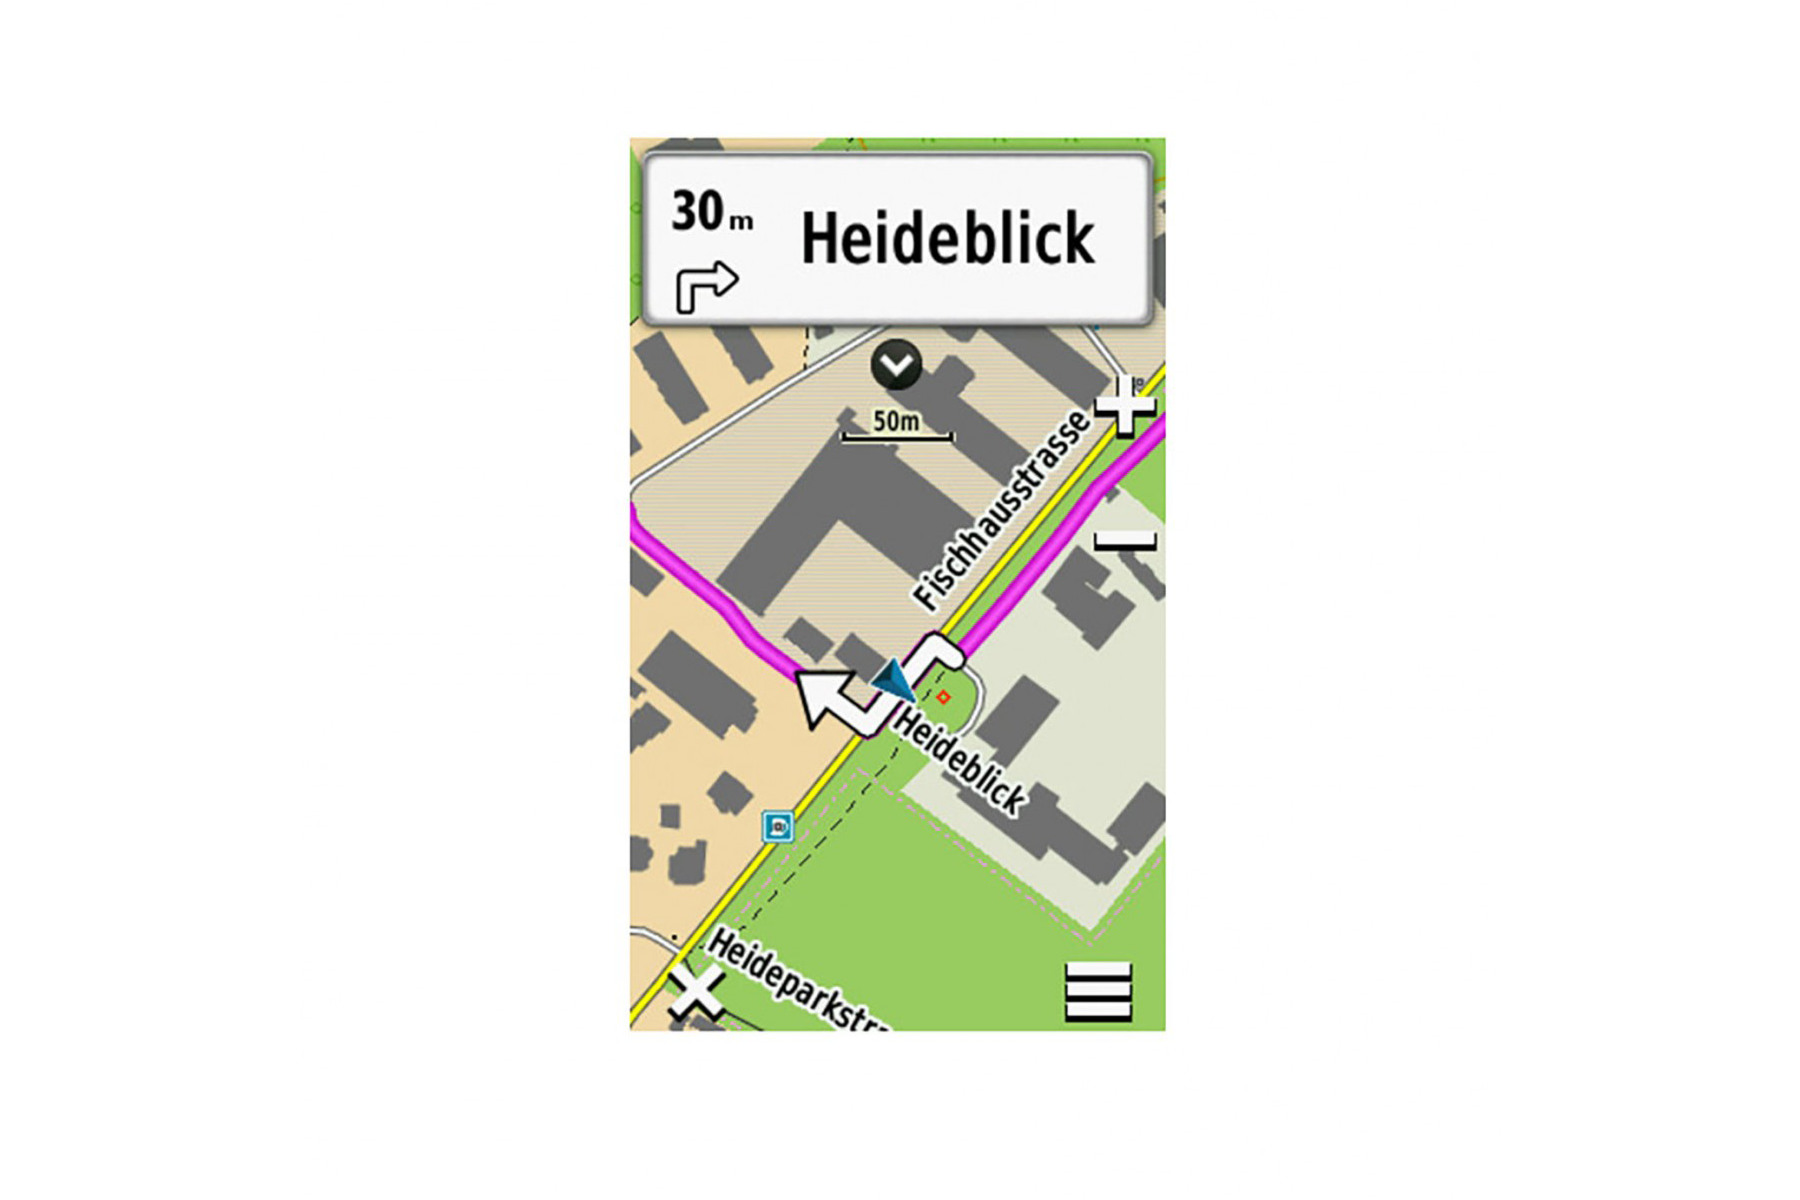 garmin topo deutschland v8 pro micro sd karte kaufen. Black Bedroom Furniture Sets. Home Design Ideas